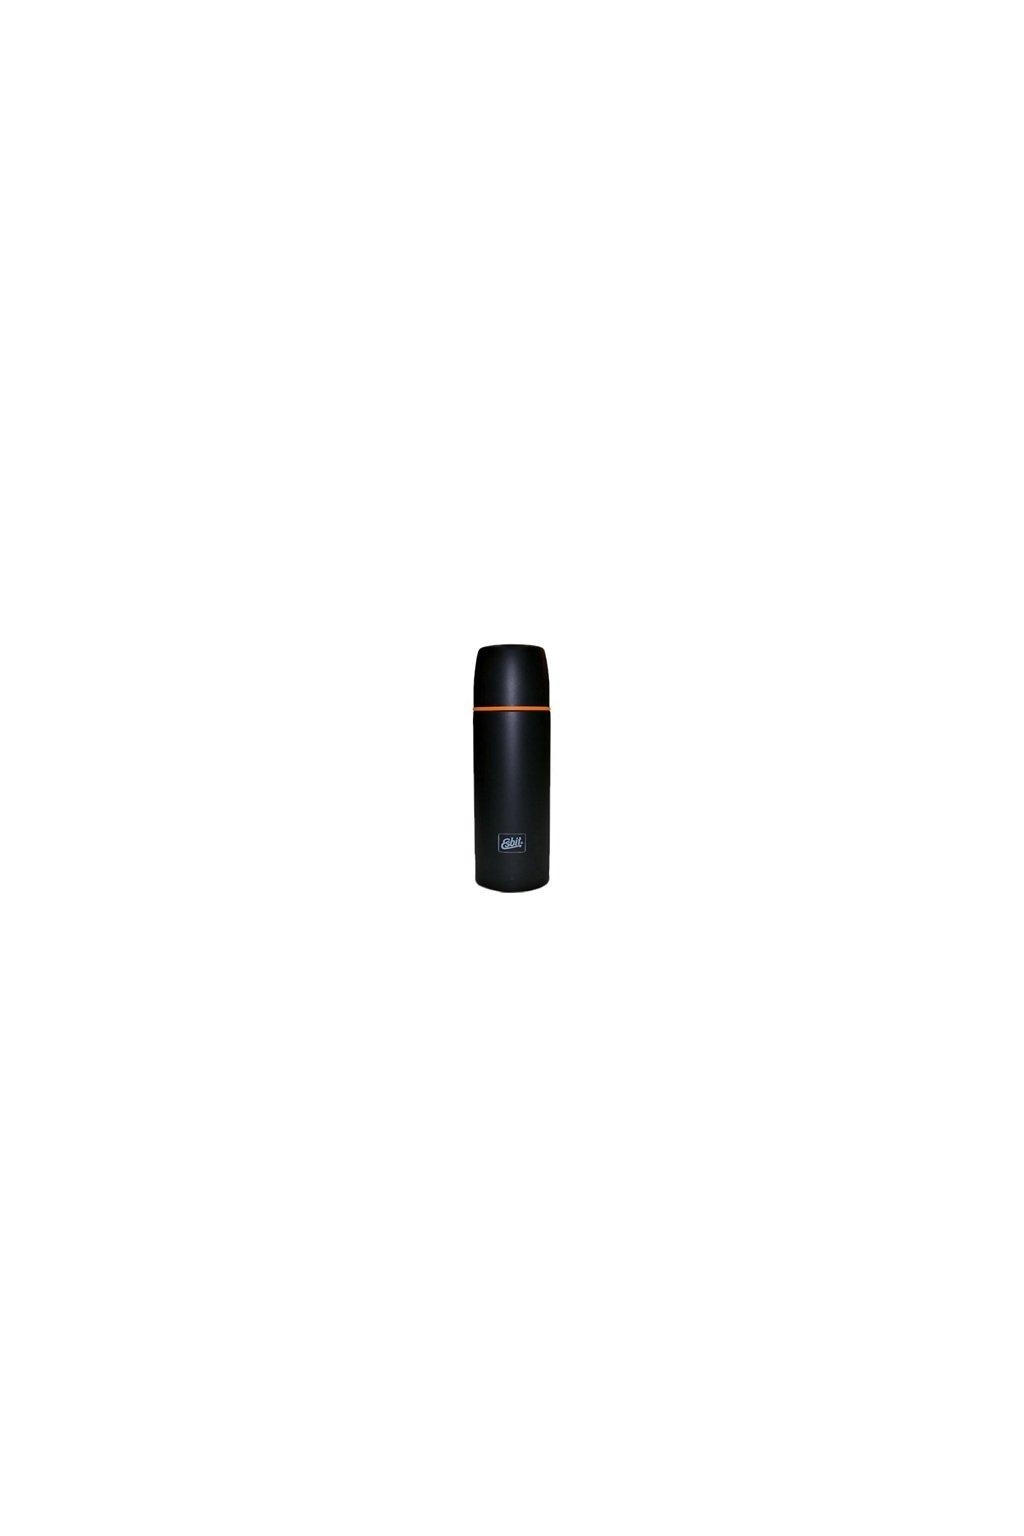 Termoska Esbit 1L černá